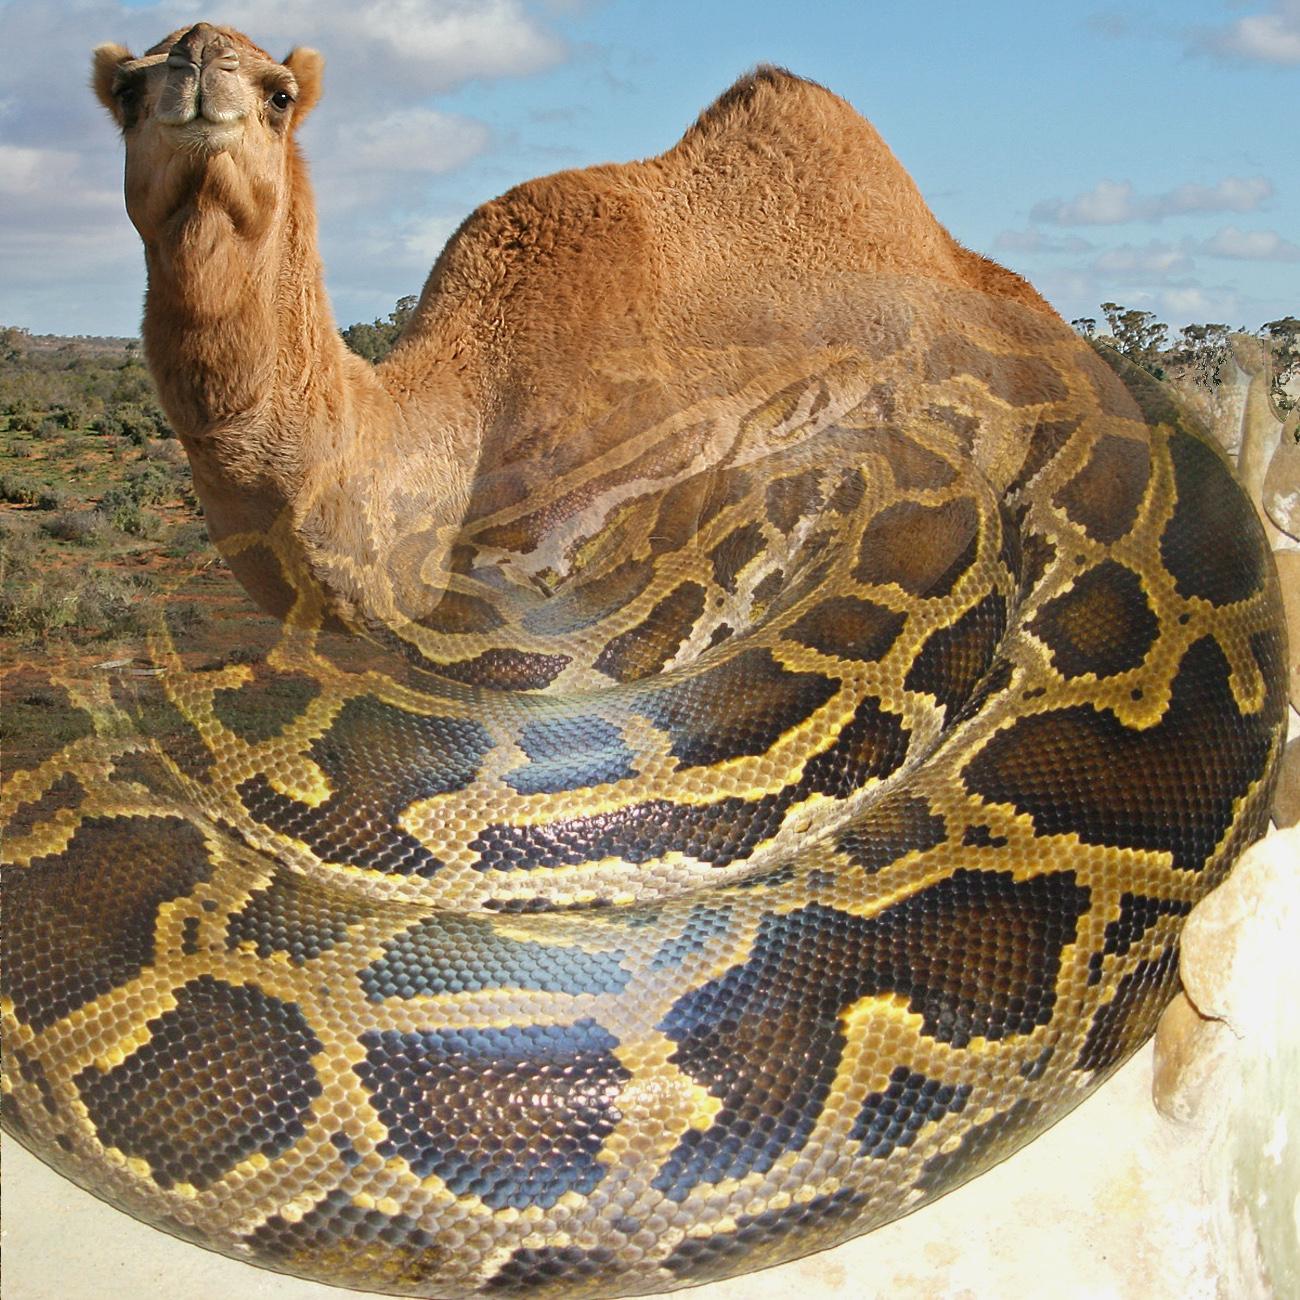 camel+snake